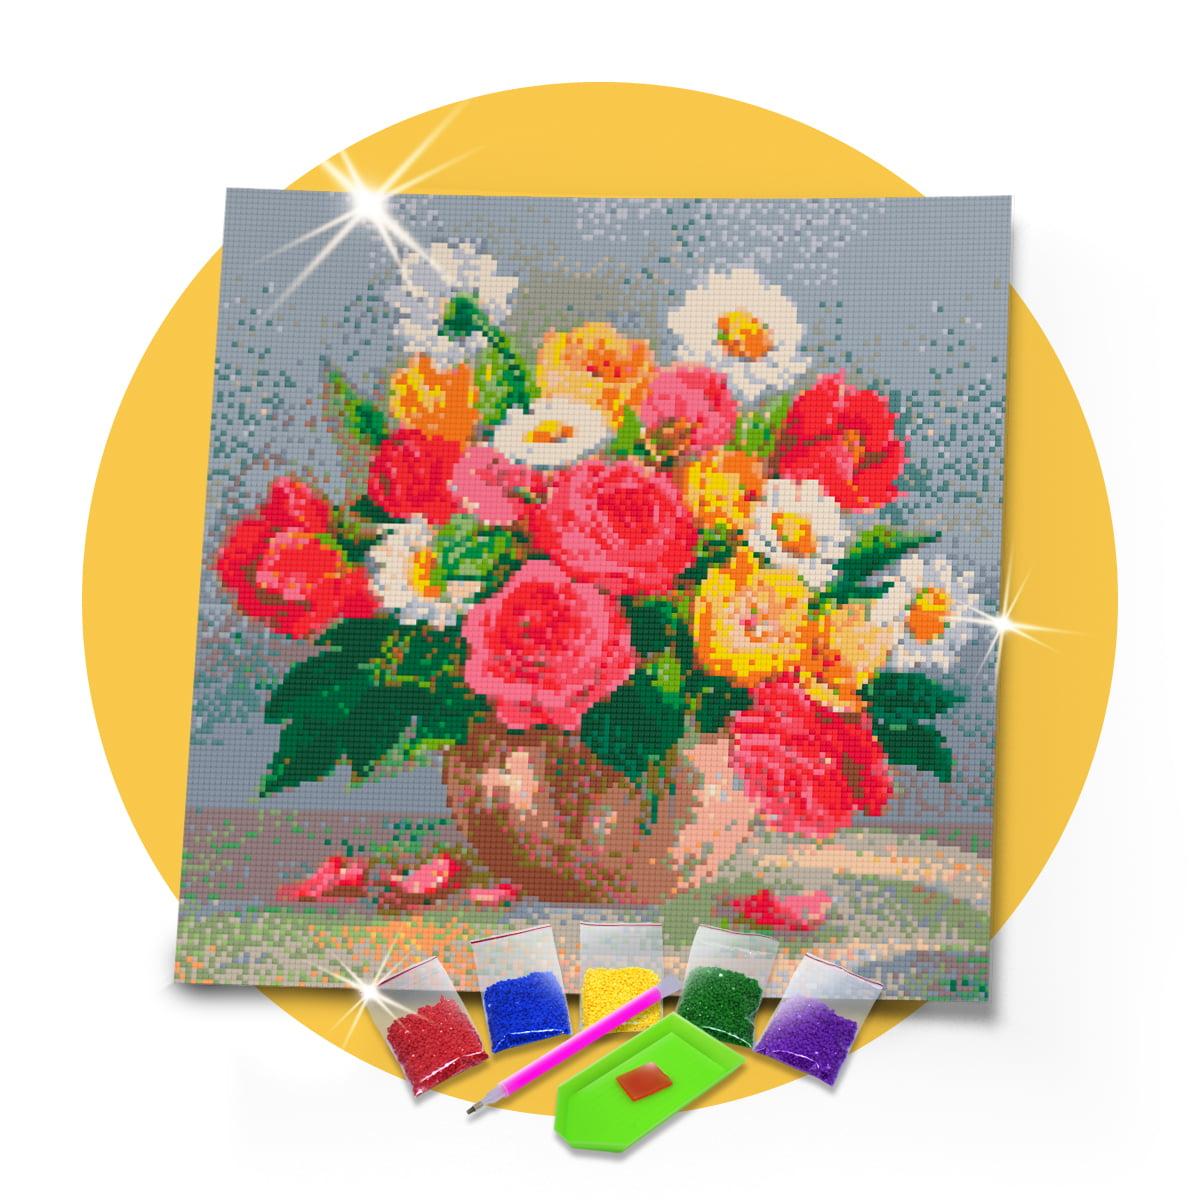 Kit Pintura com Diamantes | Tela Arranjo de Flores 40 x 40 cm - Diamante Redondo | Diamond Painting 5D DIY